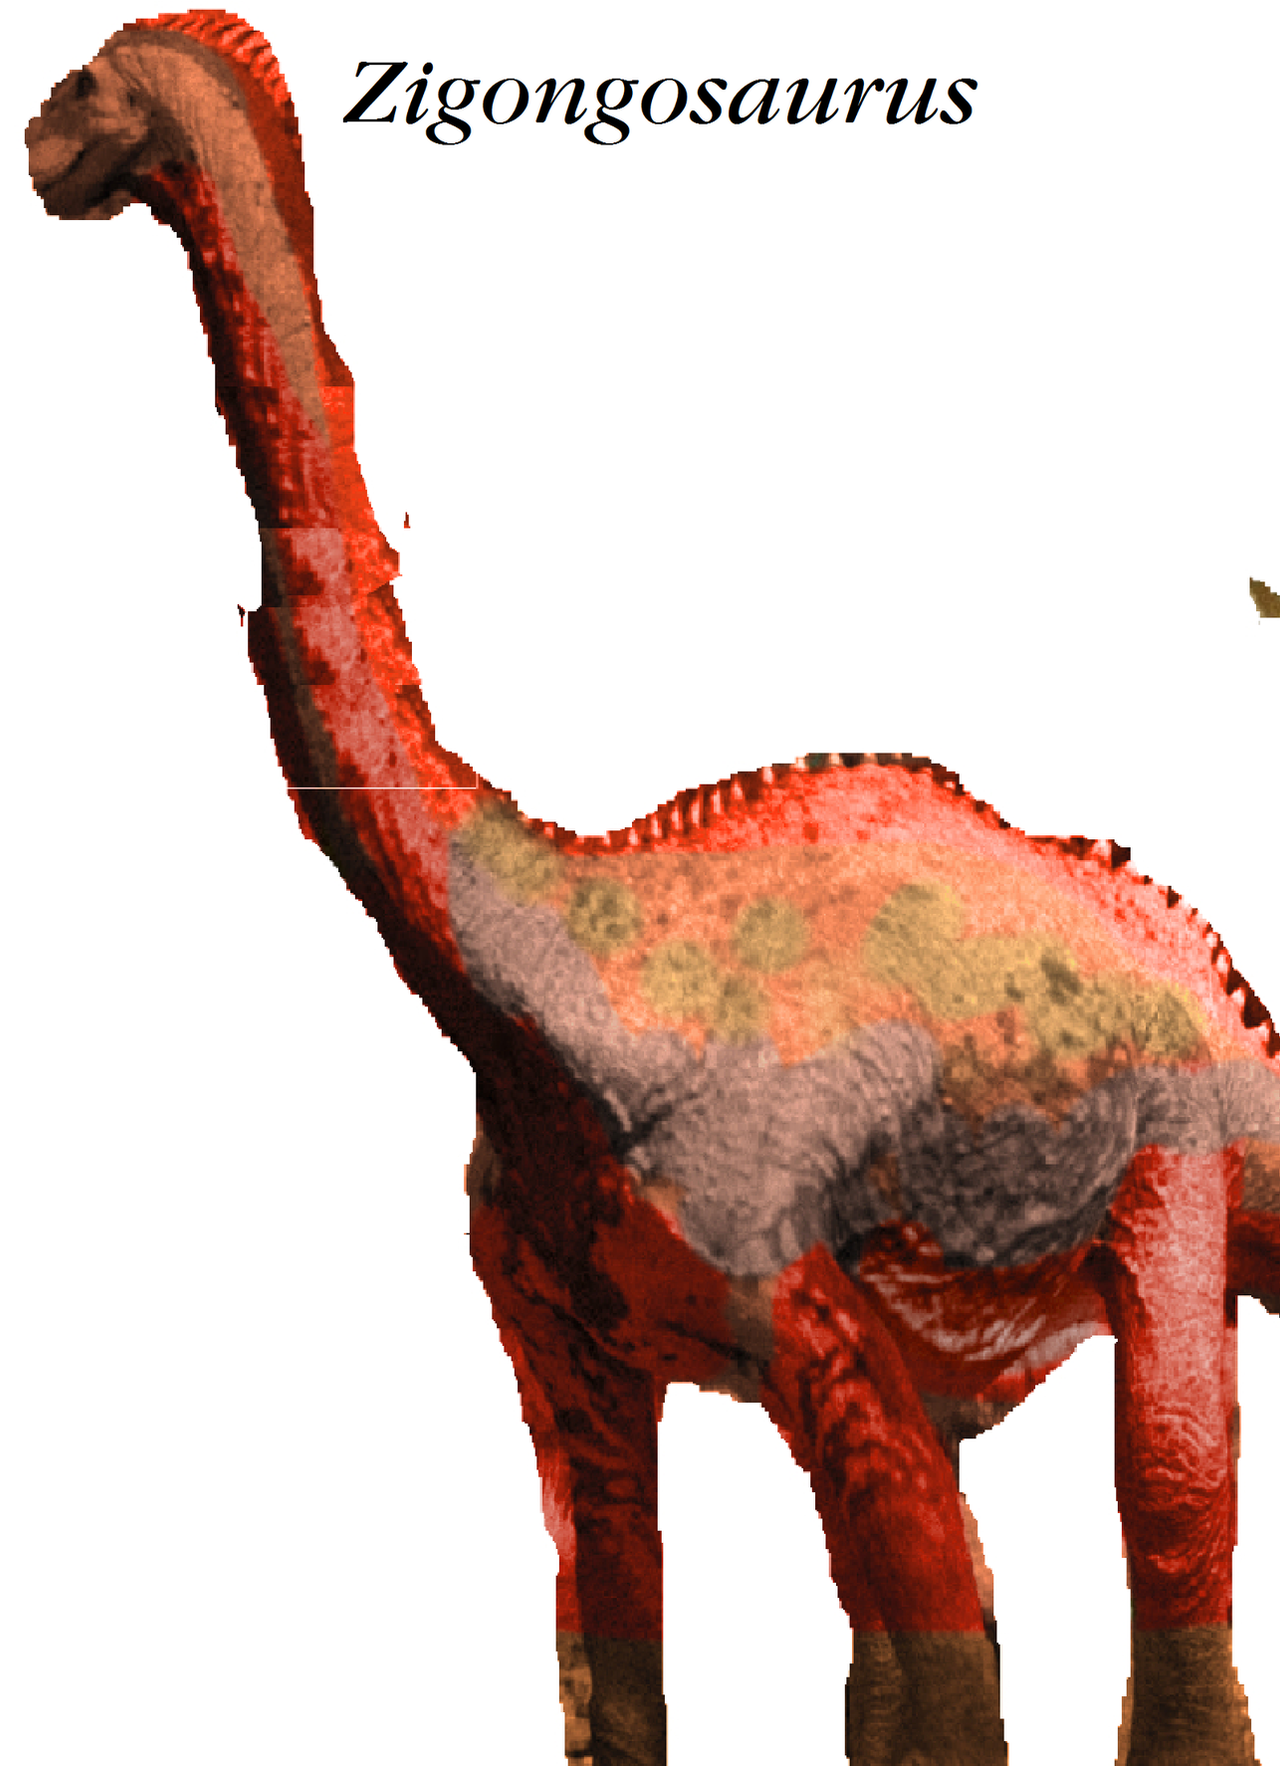 Dinosaur Train Zigongosaurus in real form by Vespisaurus ...